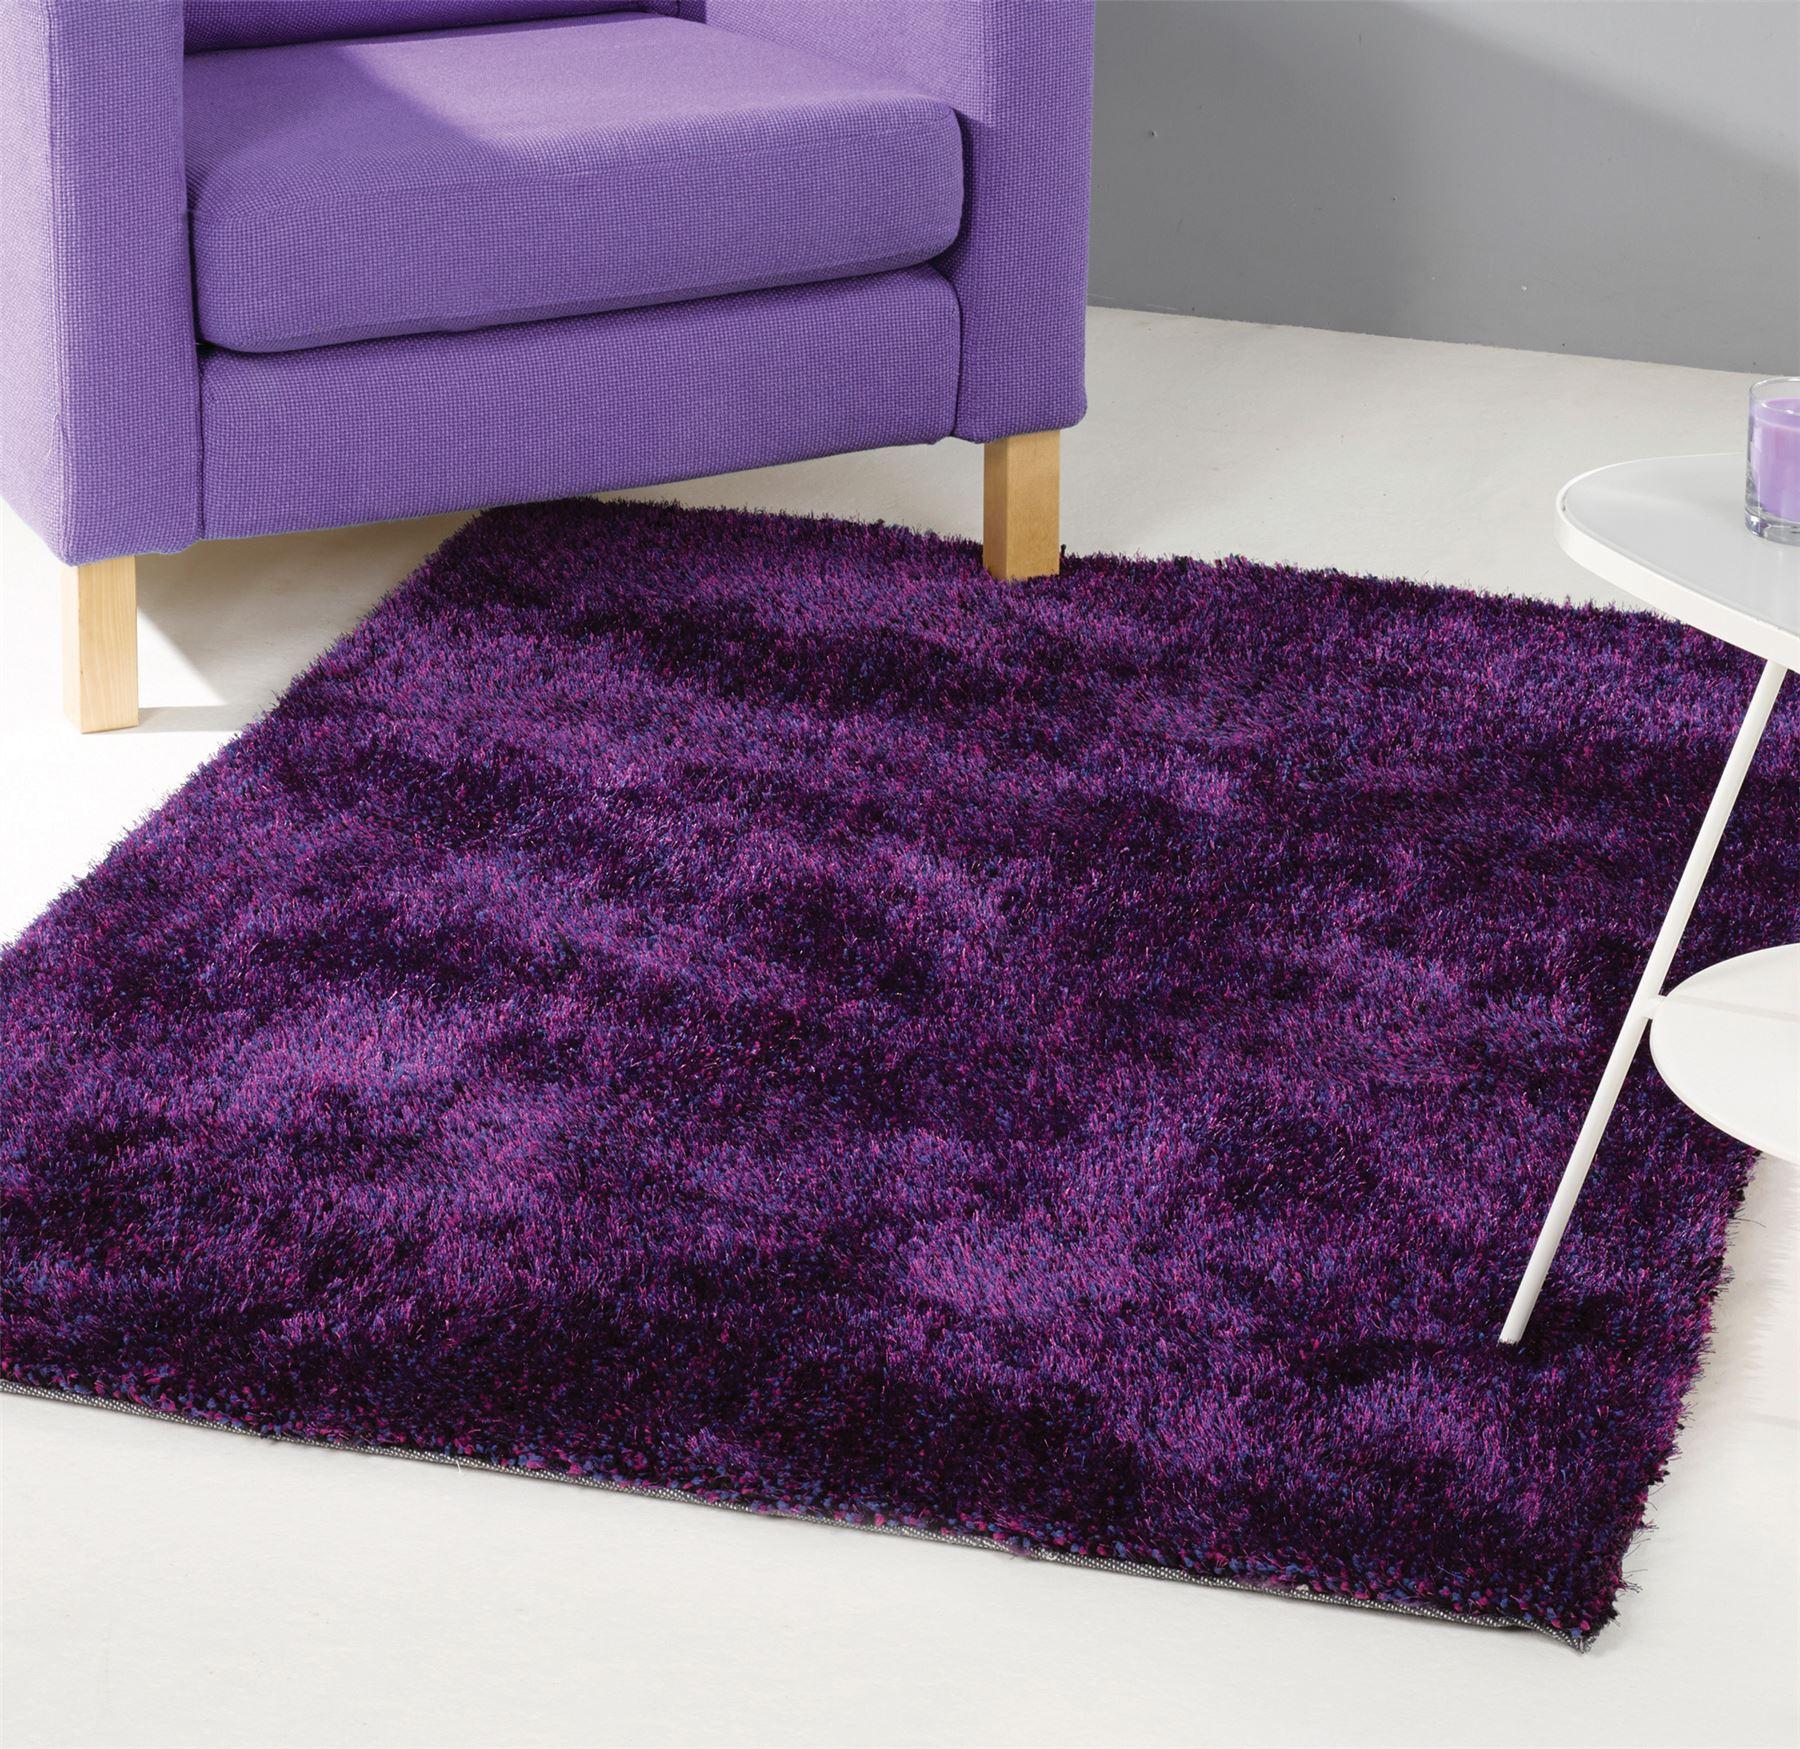 Purple And Lavender Rug: Purple Brown Cream Black Orange Green Teal Blue Toft